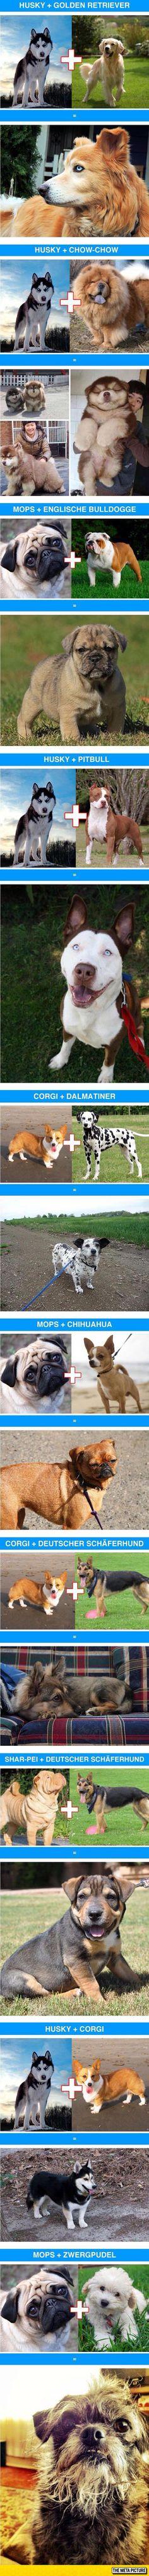 Awesome Dog Cross-Breeds